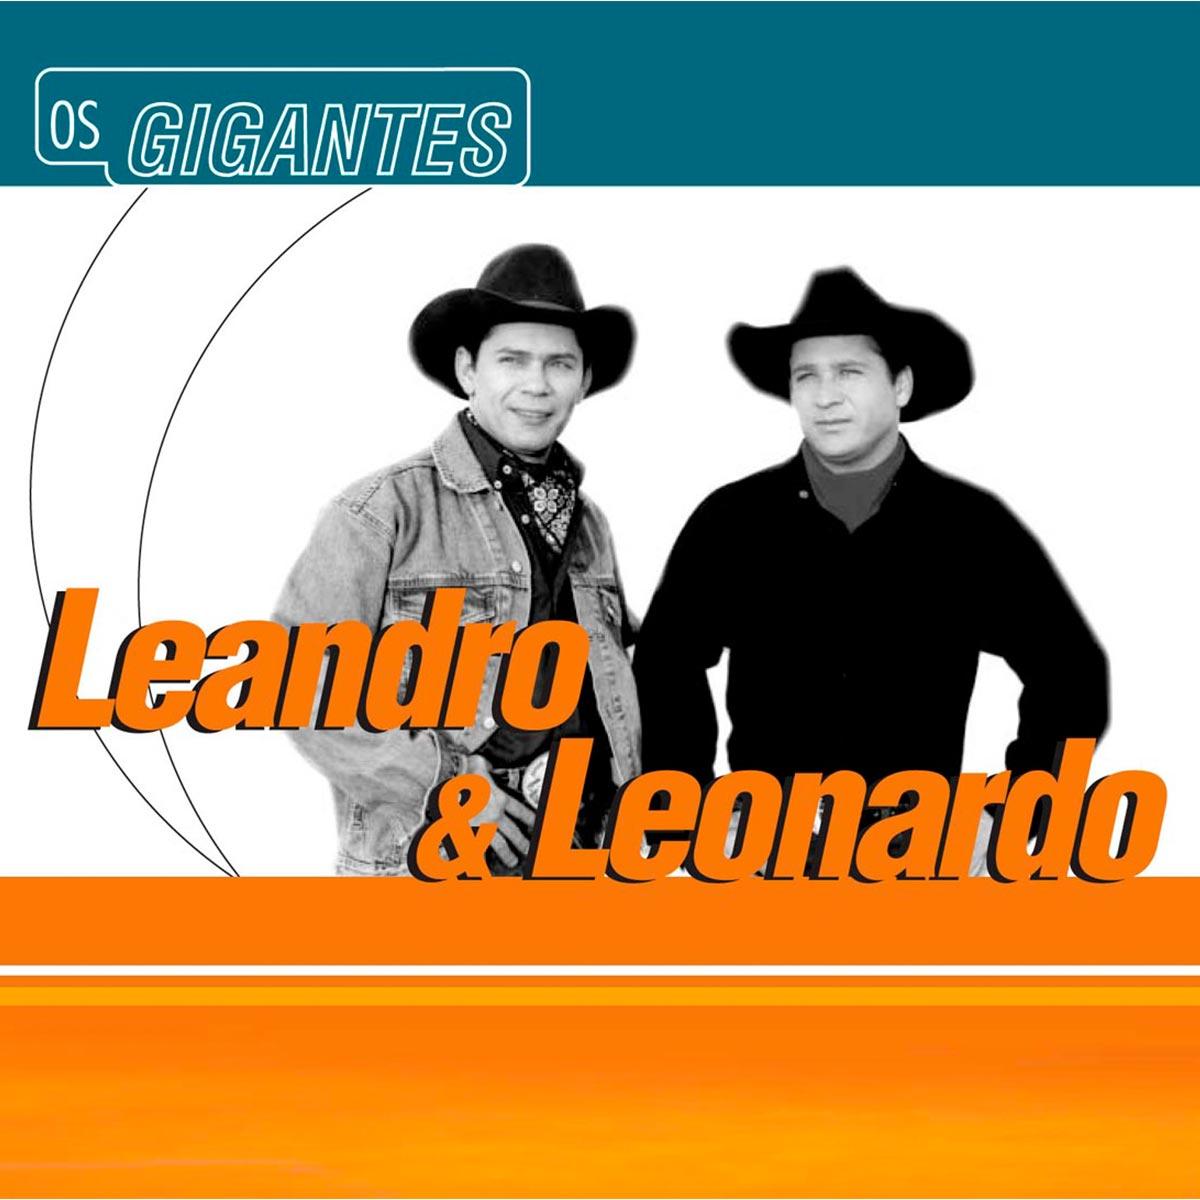 CD Leandro & Leonardo S�rie Os Gigantes